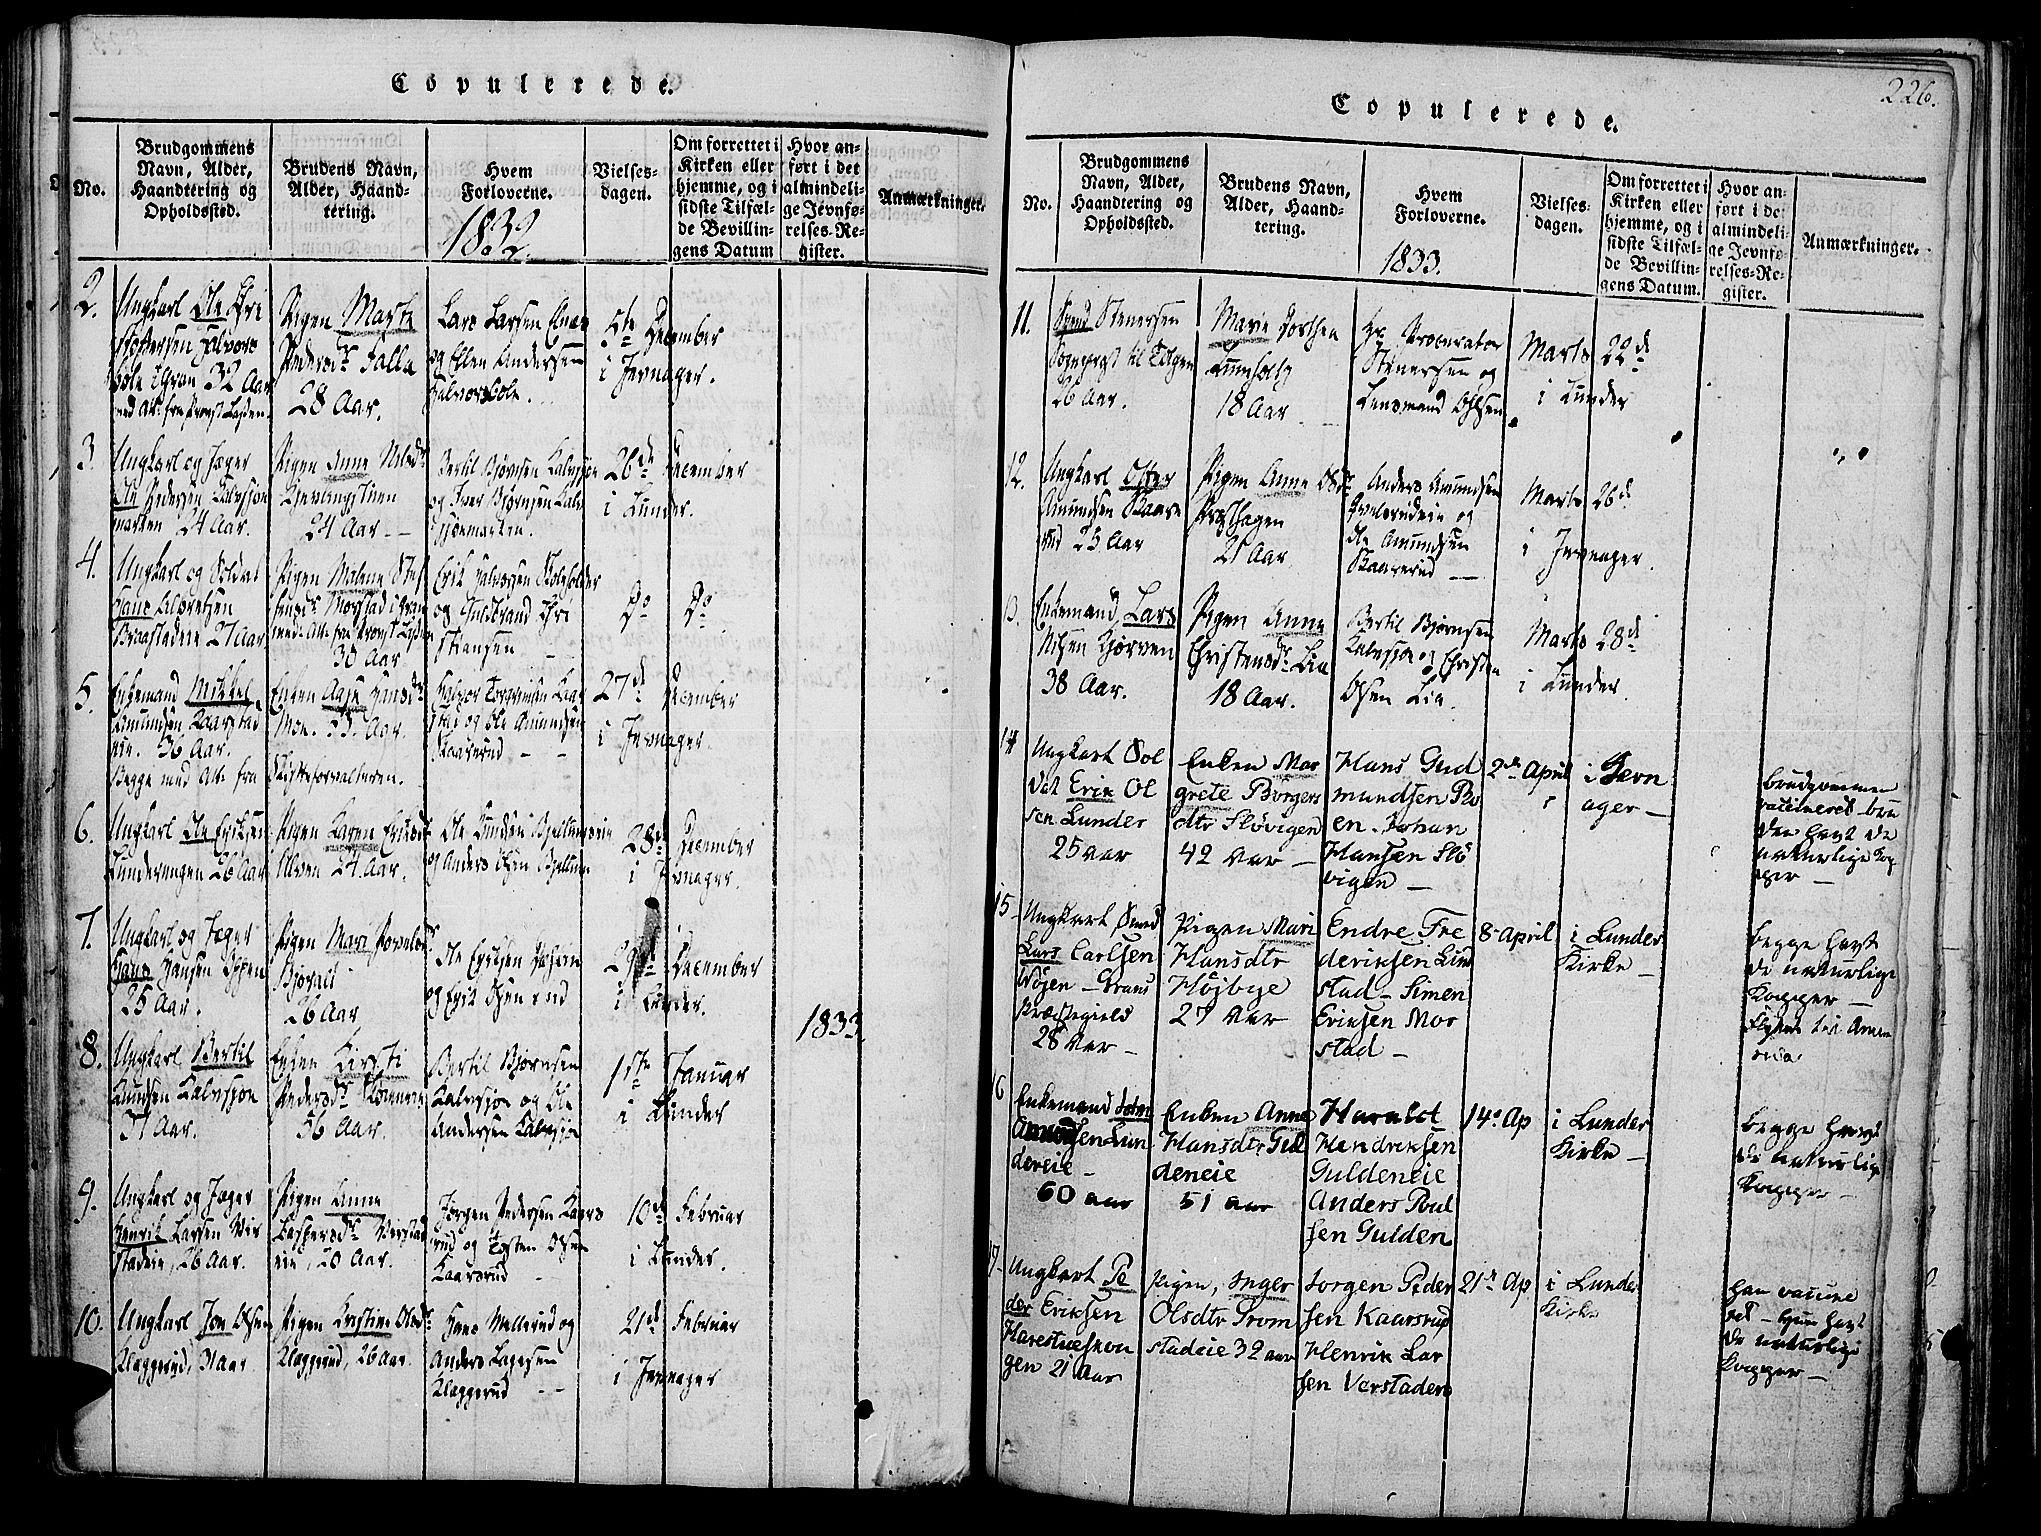 SAH, Jevnaker prestekontor, Ministerialbok nr. 5, 1815-1837, s. 226